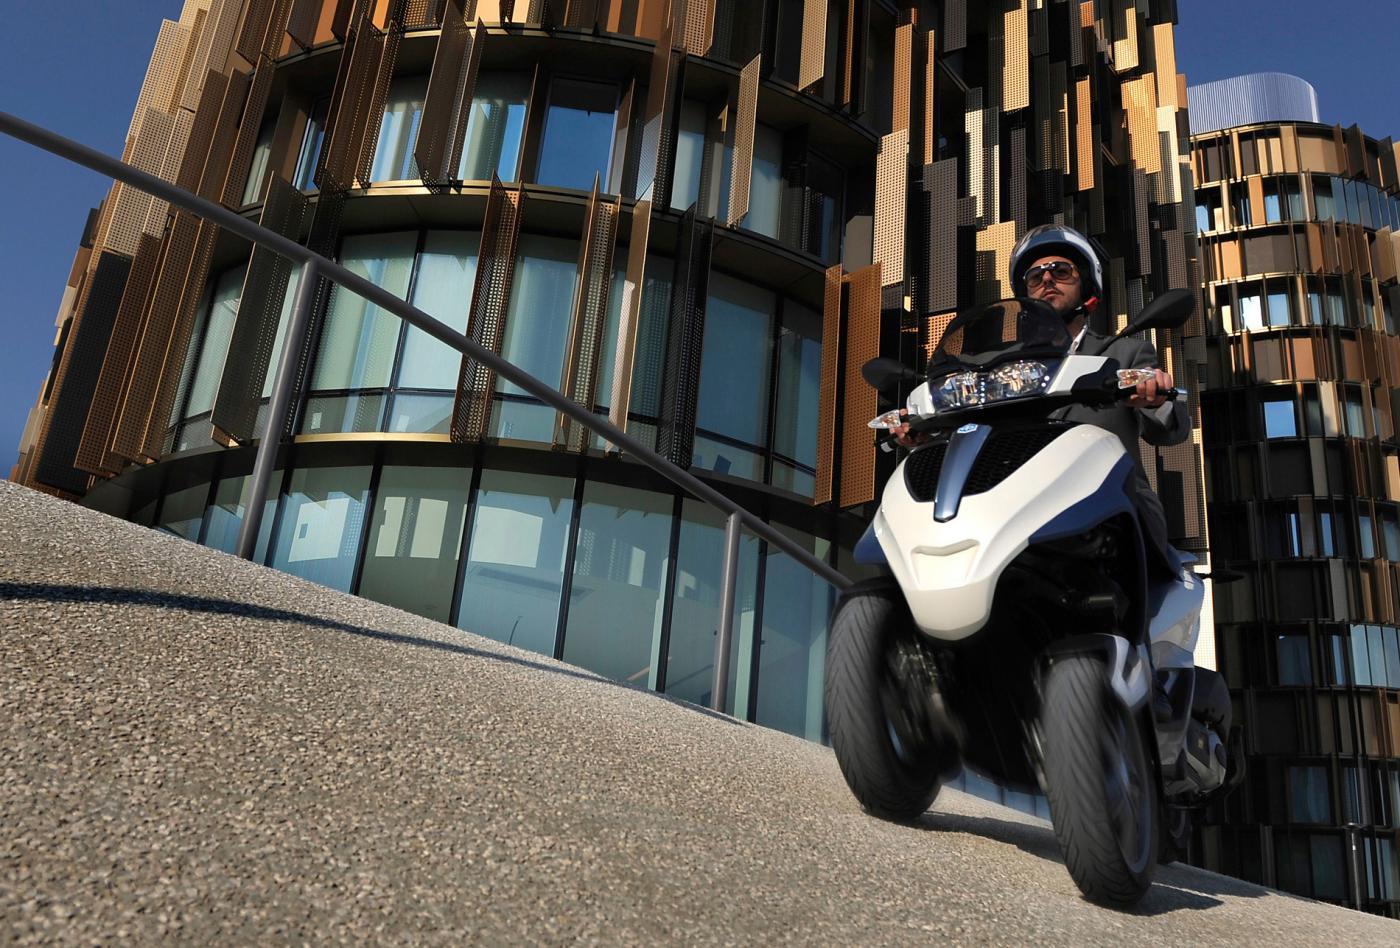 vente de scooters au haillan en gironde moto scooter marseille occasion moto. Black Bedroom Furniture Sets. Home Design Ideas